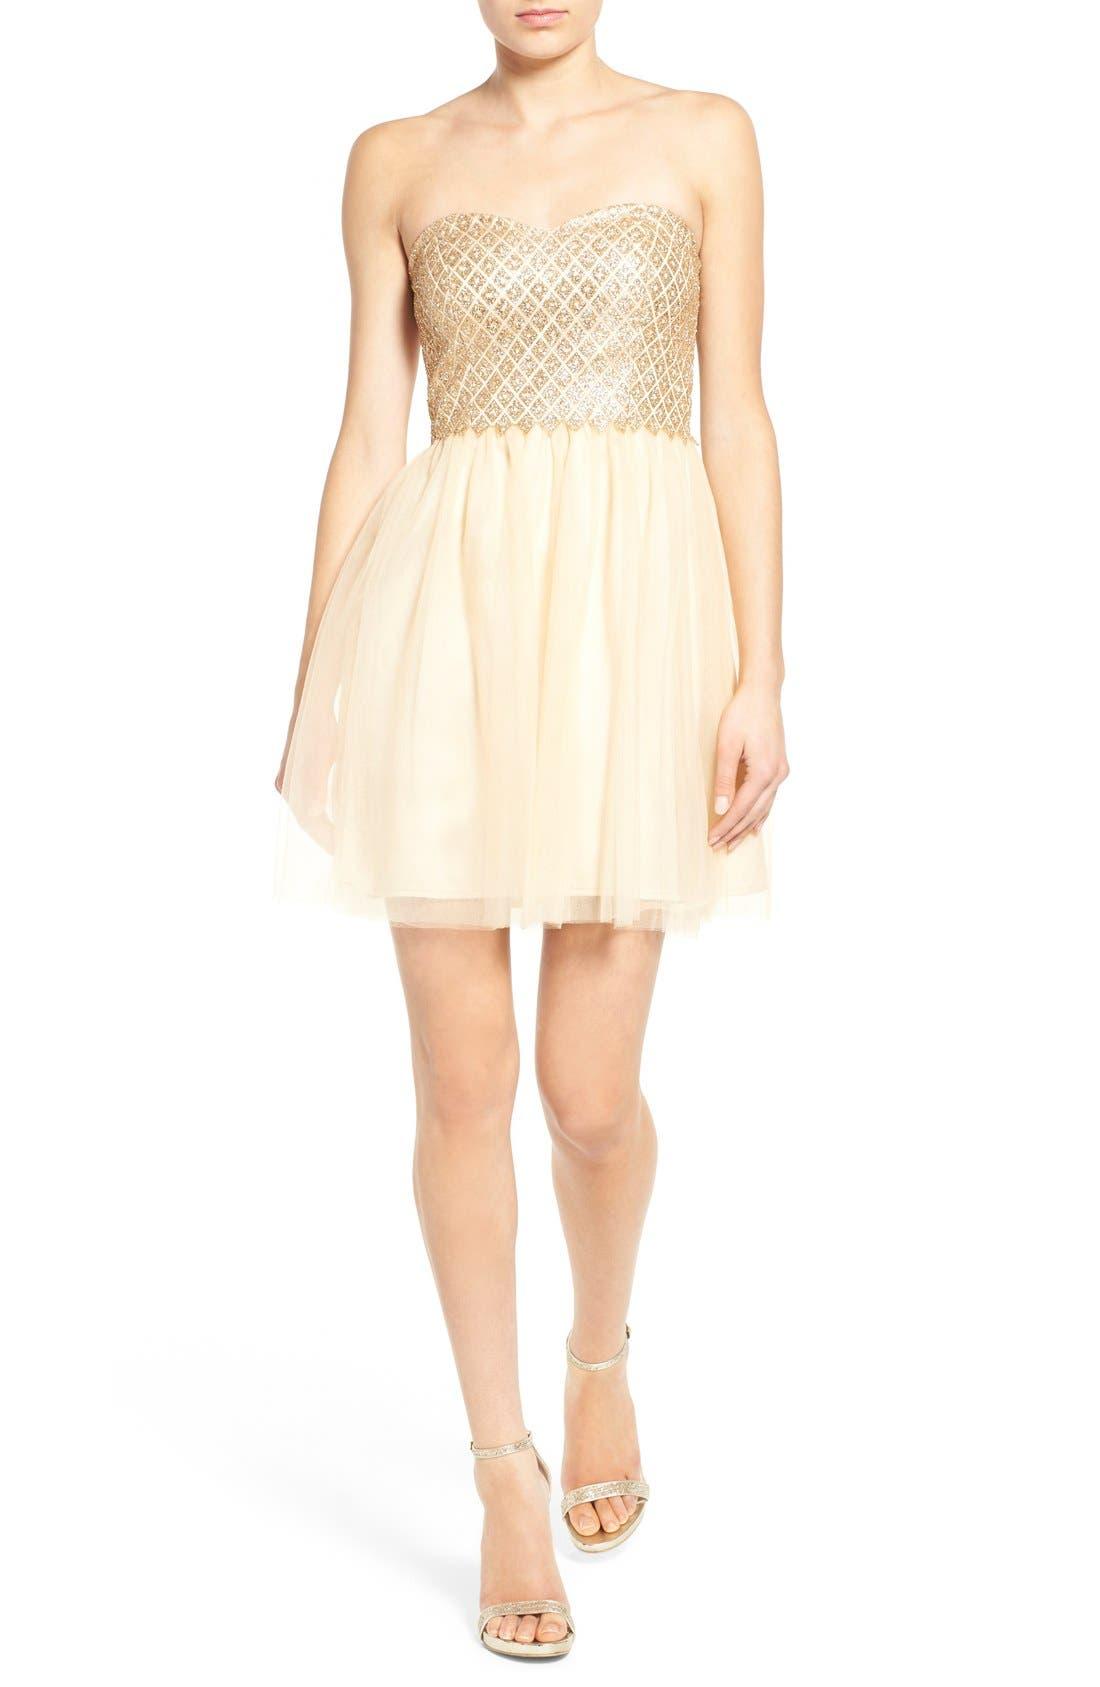 Alternate Image 1 Selected - a. drea Strapless Glitter Bodice Fit & Flare Dress